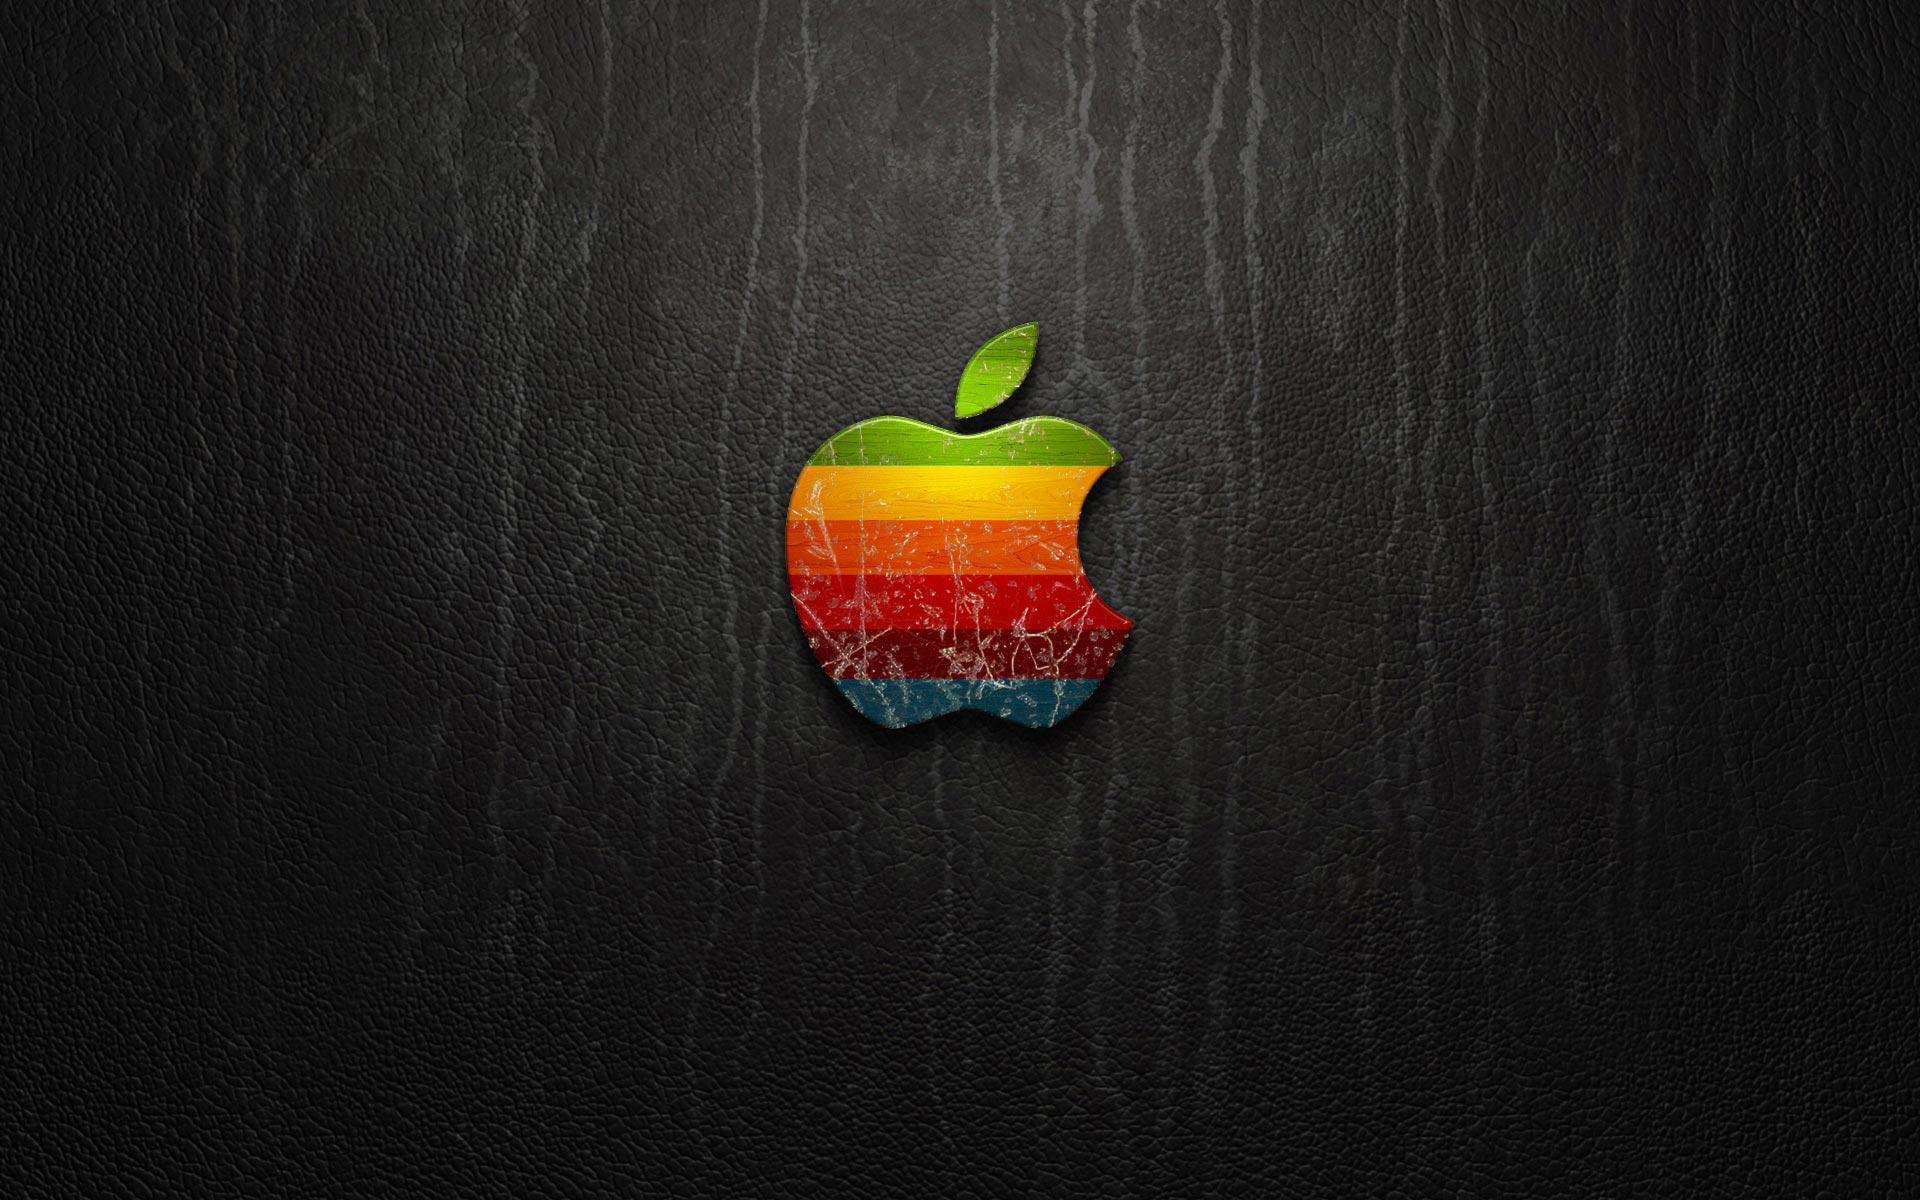 Imac Wallpaper High Resolution: Apple IMac Wallpapers